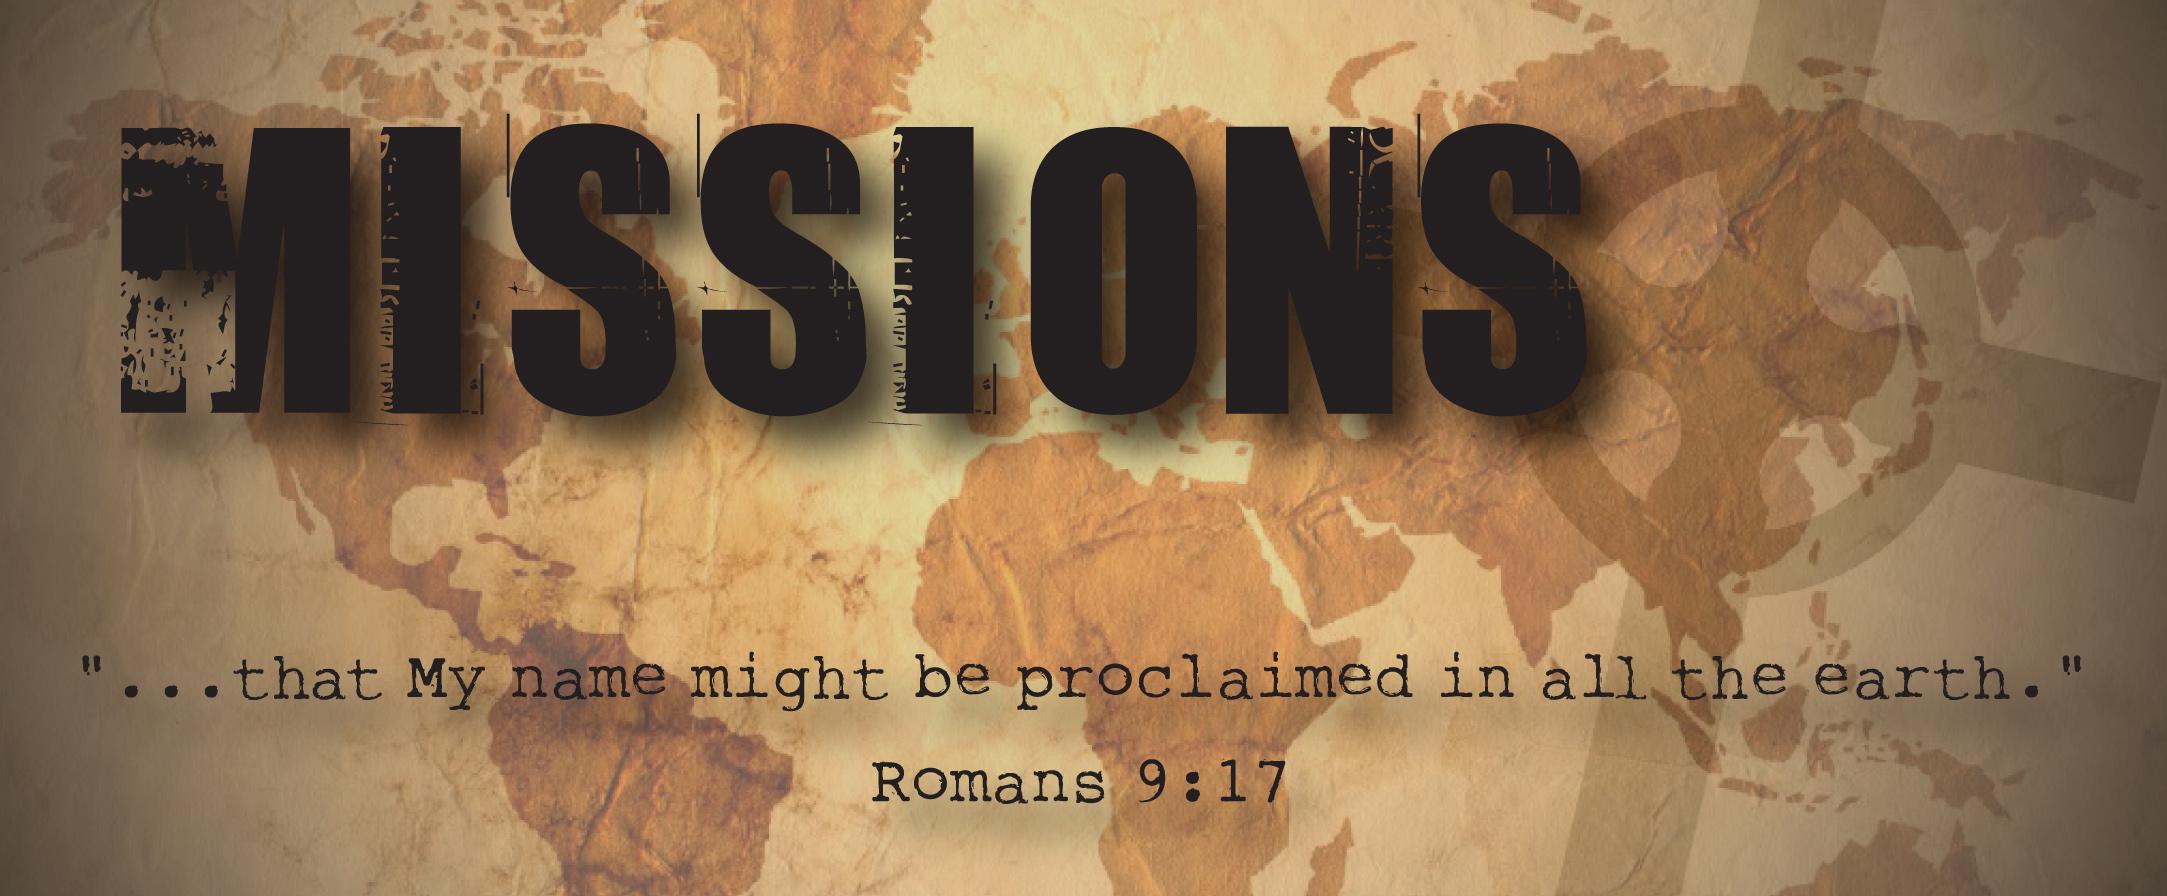 Missions-2.jpg